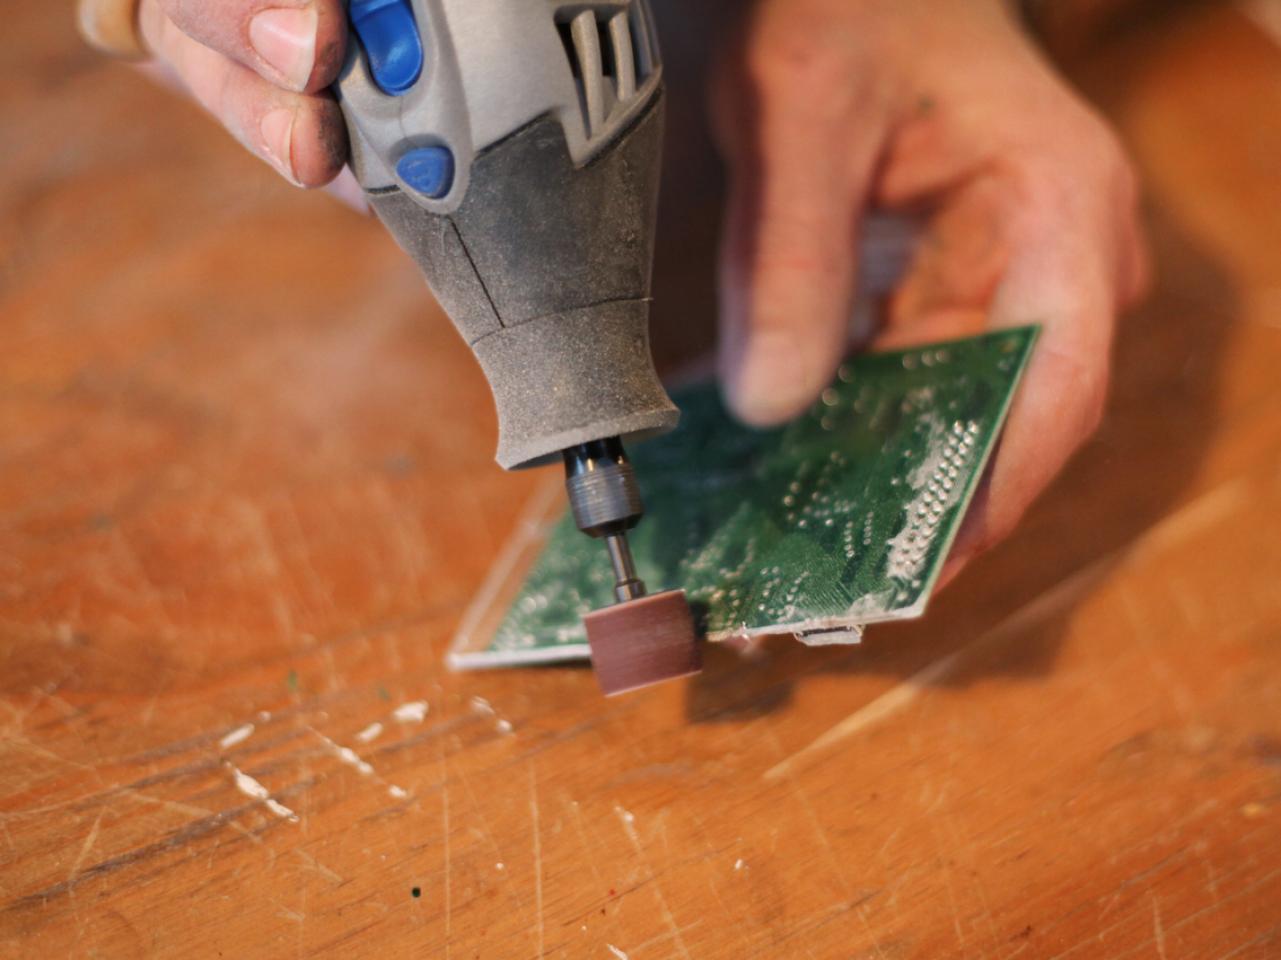 computer circuit board belt buckle hgtvsanding edges of circuit board with dremel tool